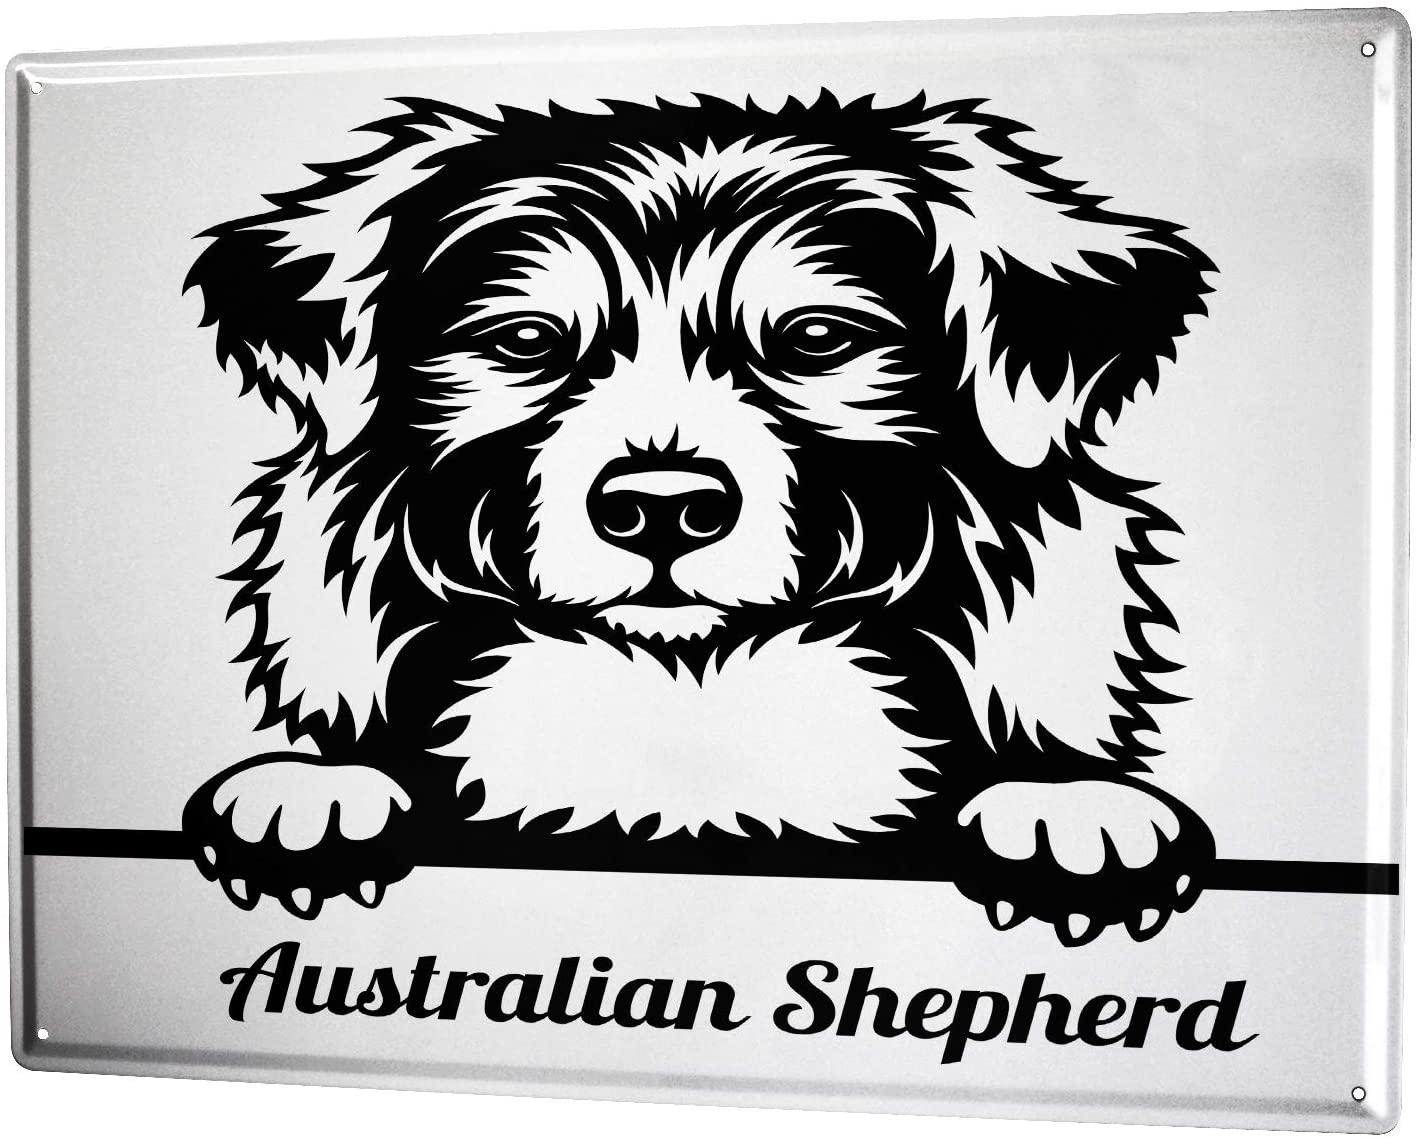 SINCE 2004 Tin Plate Dogs Breed Australian Shepherd Dog